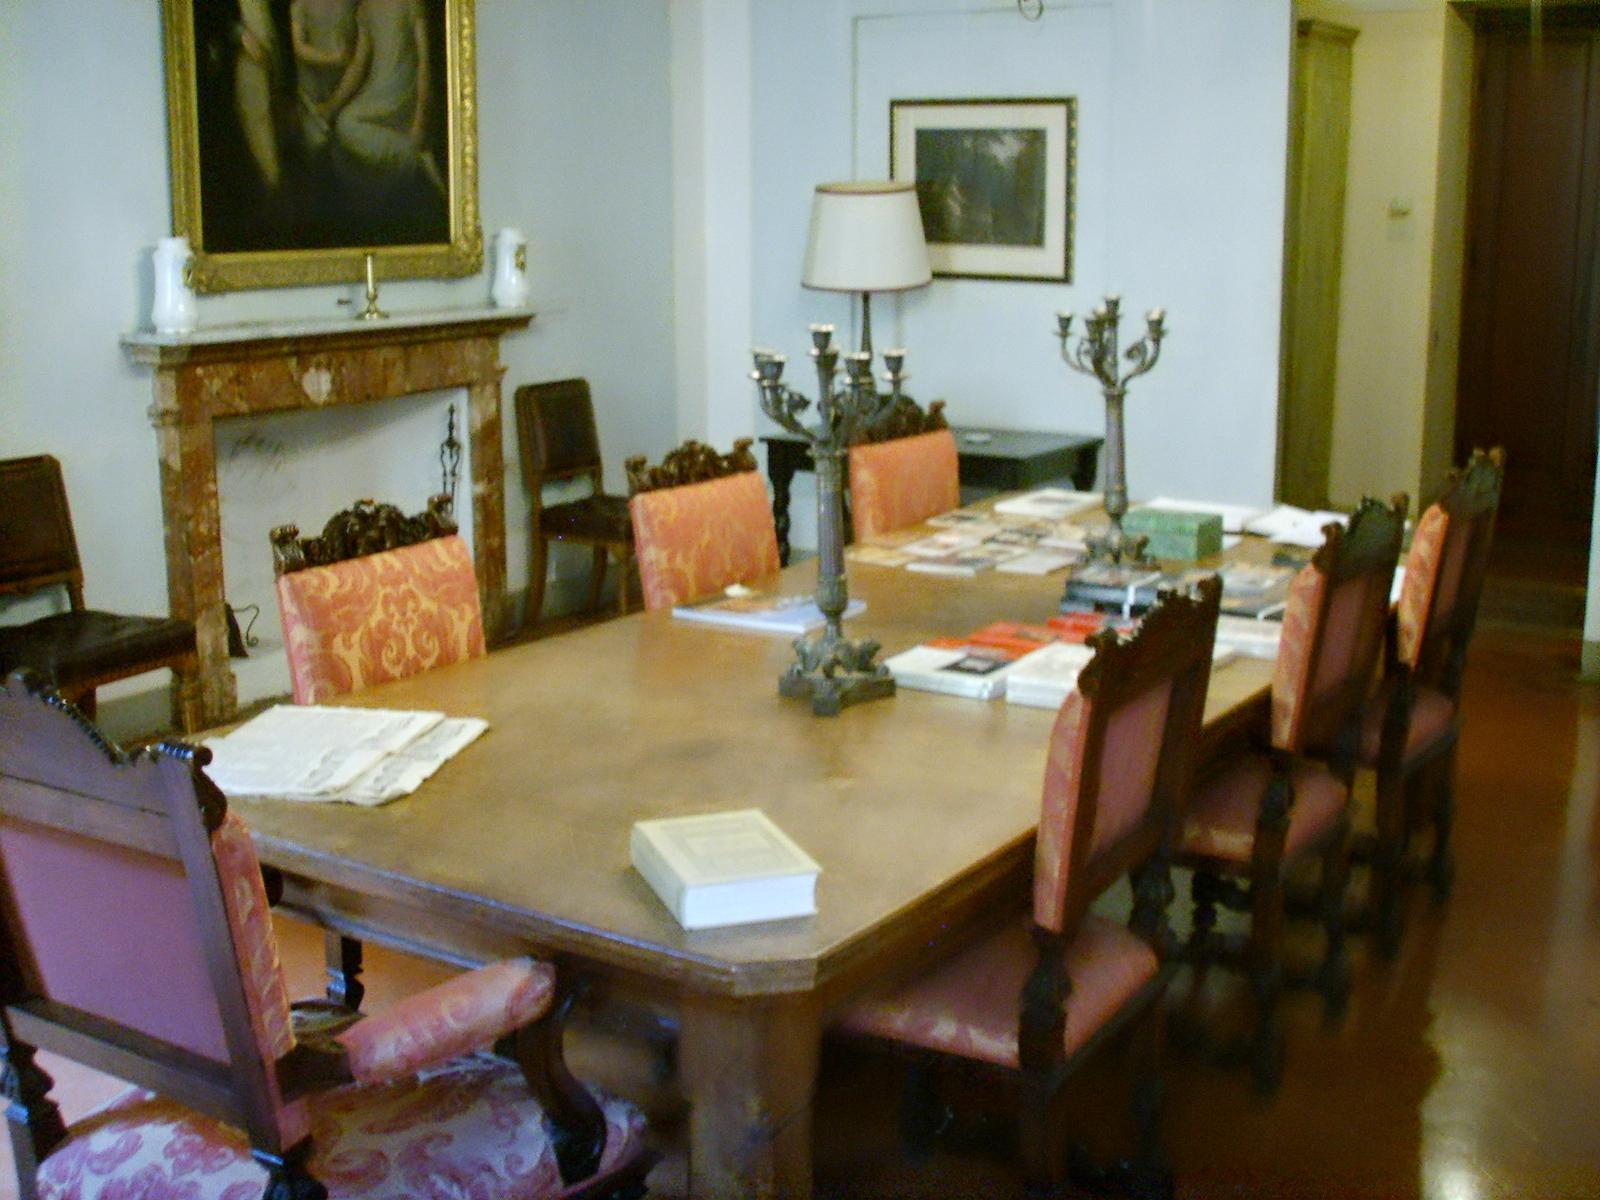 File:Casa Guidi, sala da pranzo 01.JPG - Wikimedia Commons